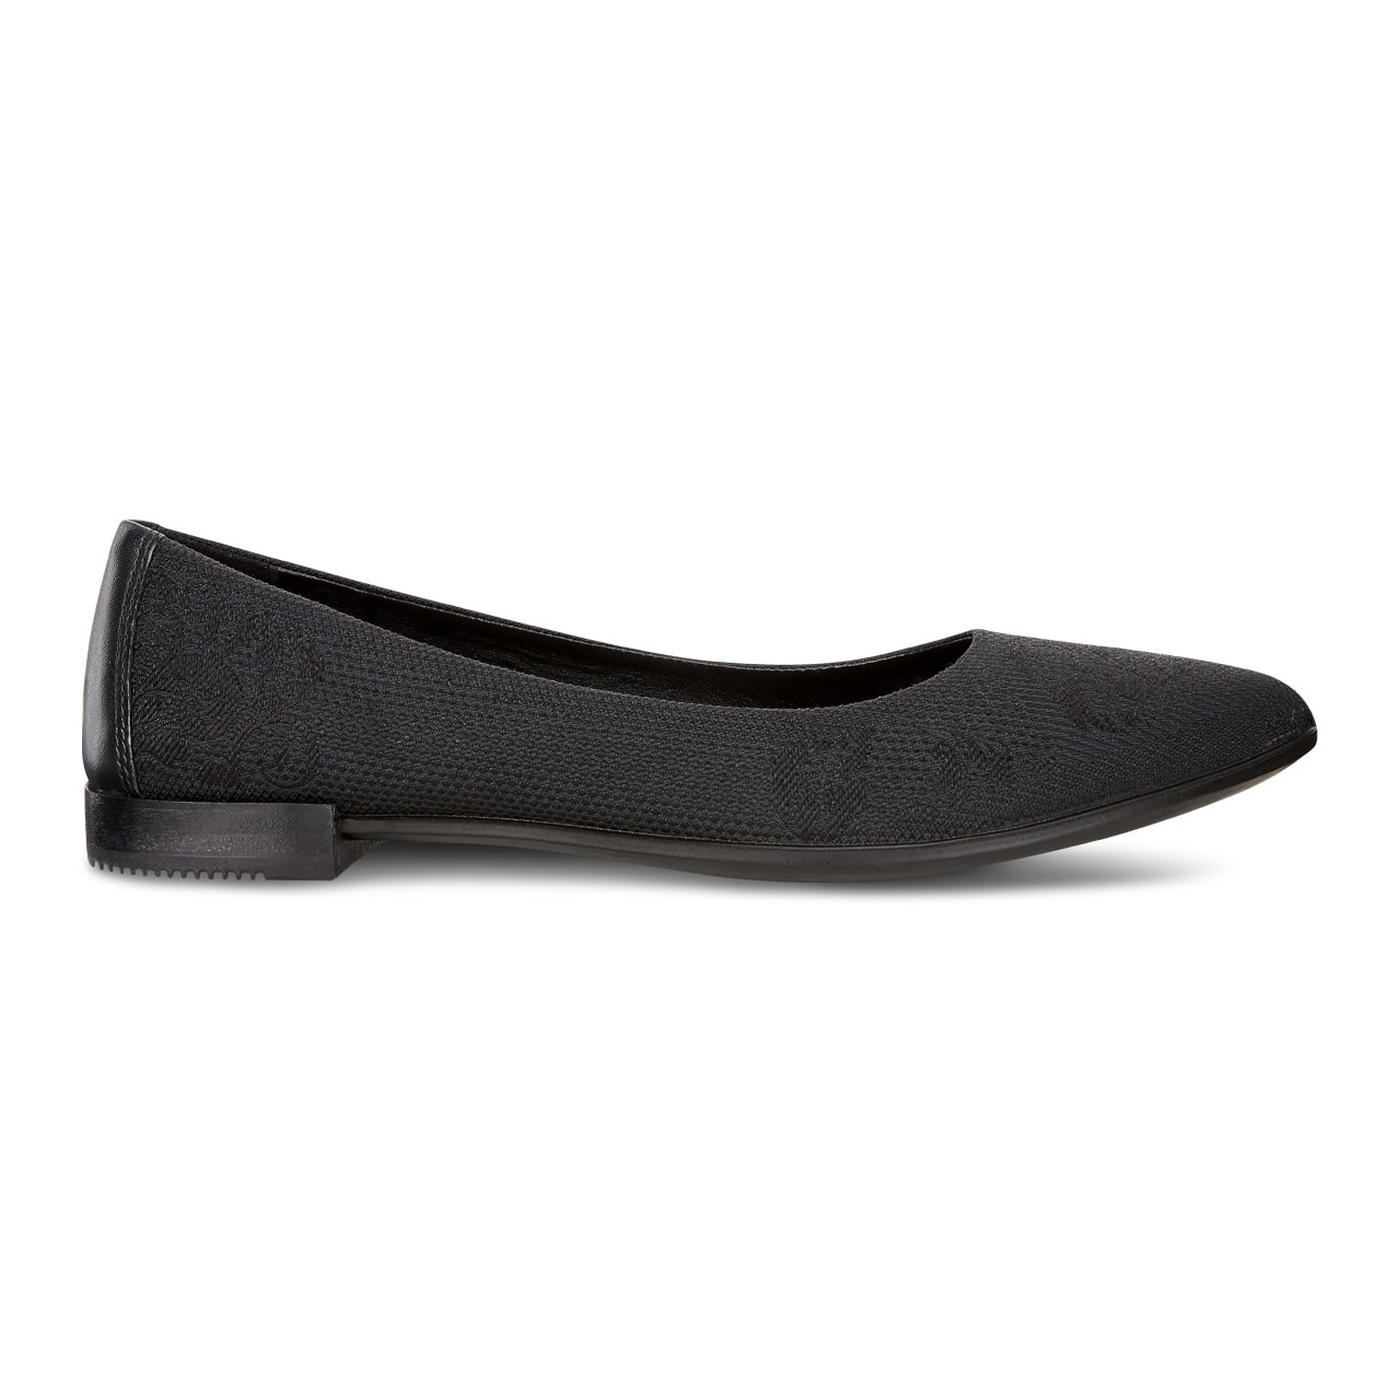 5b32d38156 ECCO Shape Textured Ballerina | Women's Shoes | ECCO® Shoes